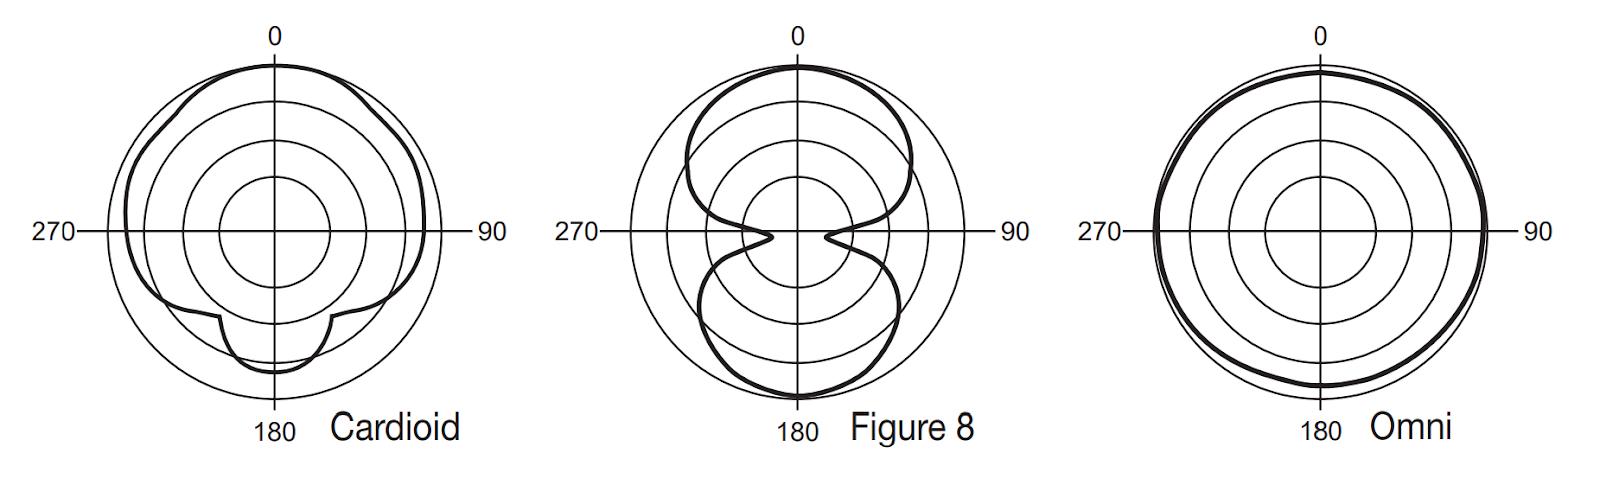 MXL 4000 Polar Pattern